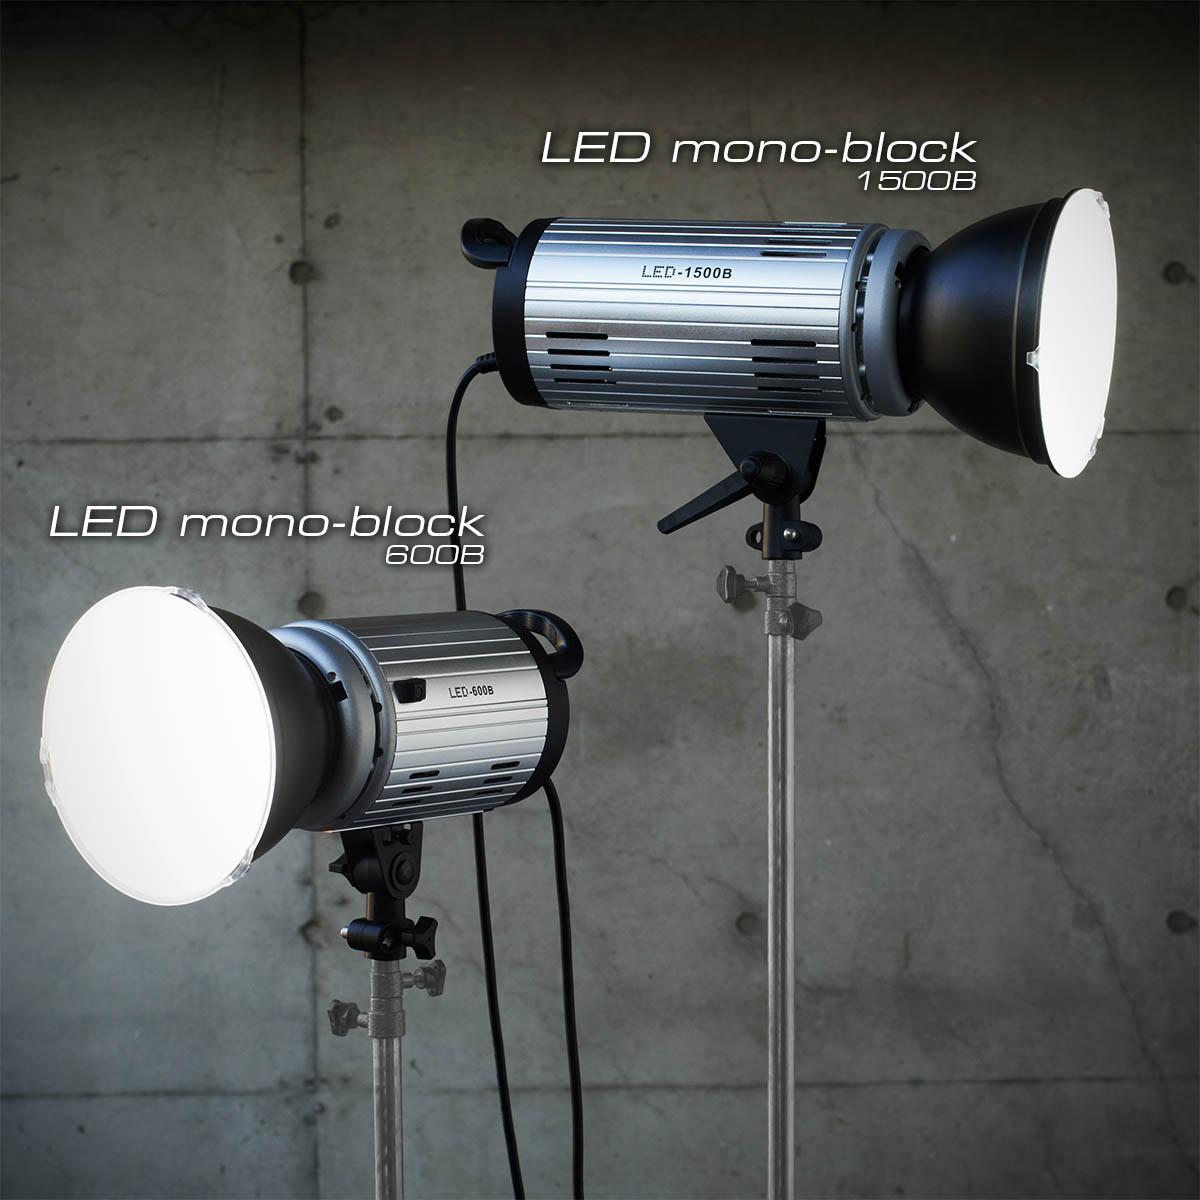 LEDmono-block1500B+600B_1200px